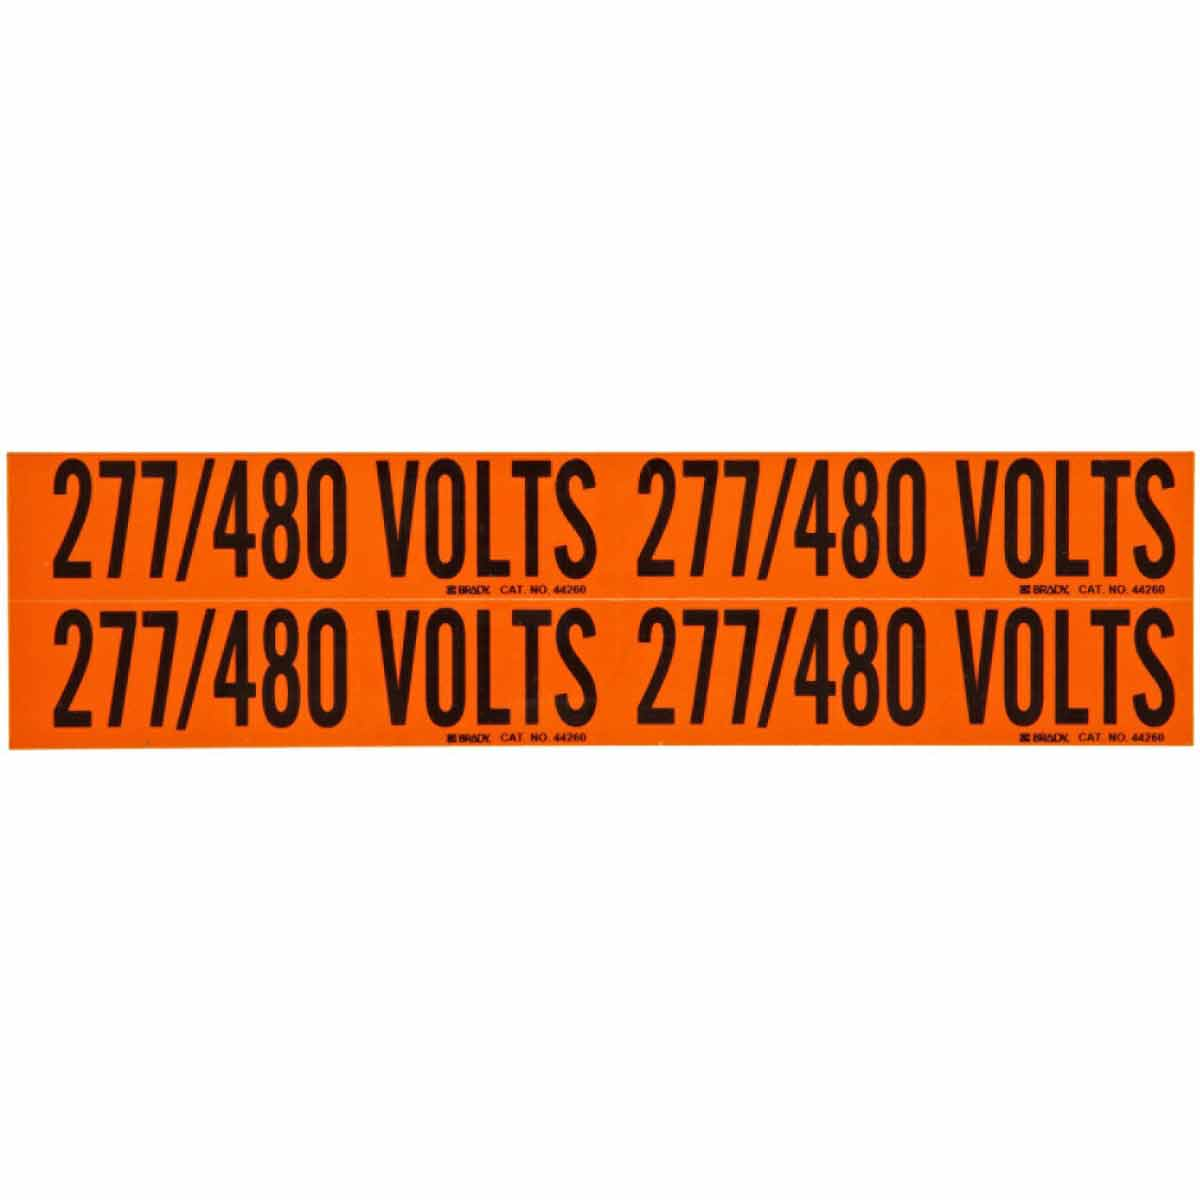 BRADY 44260 Conduit & VoltageMarker 277/480 Volts